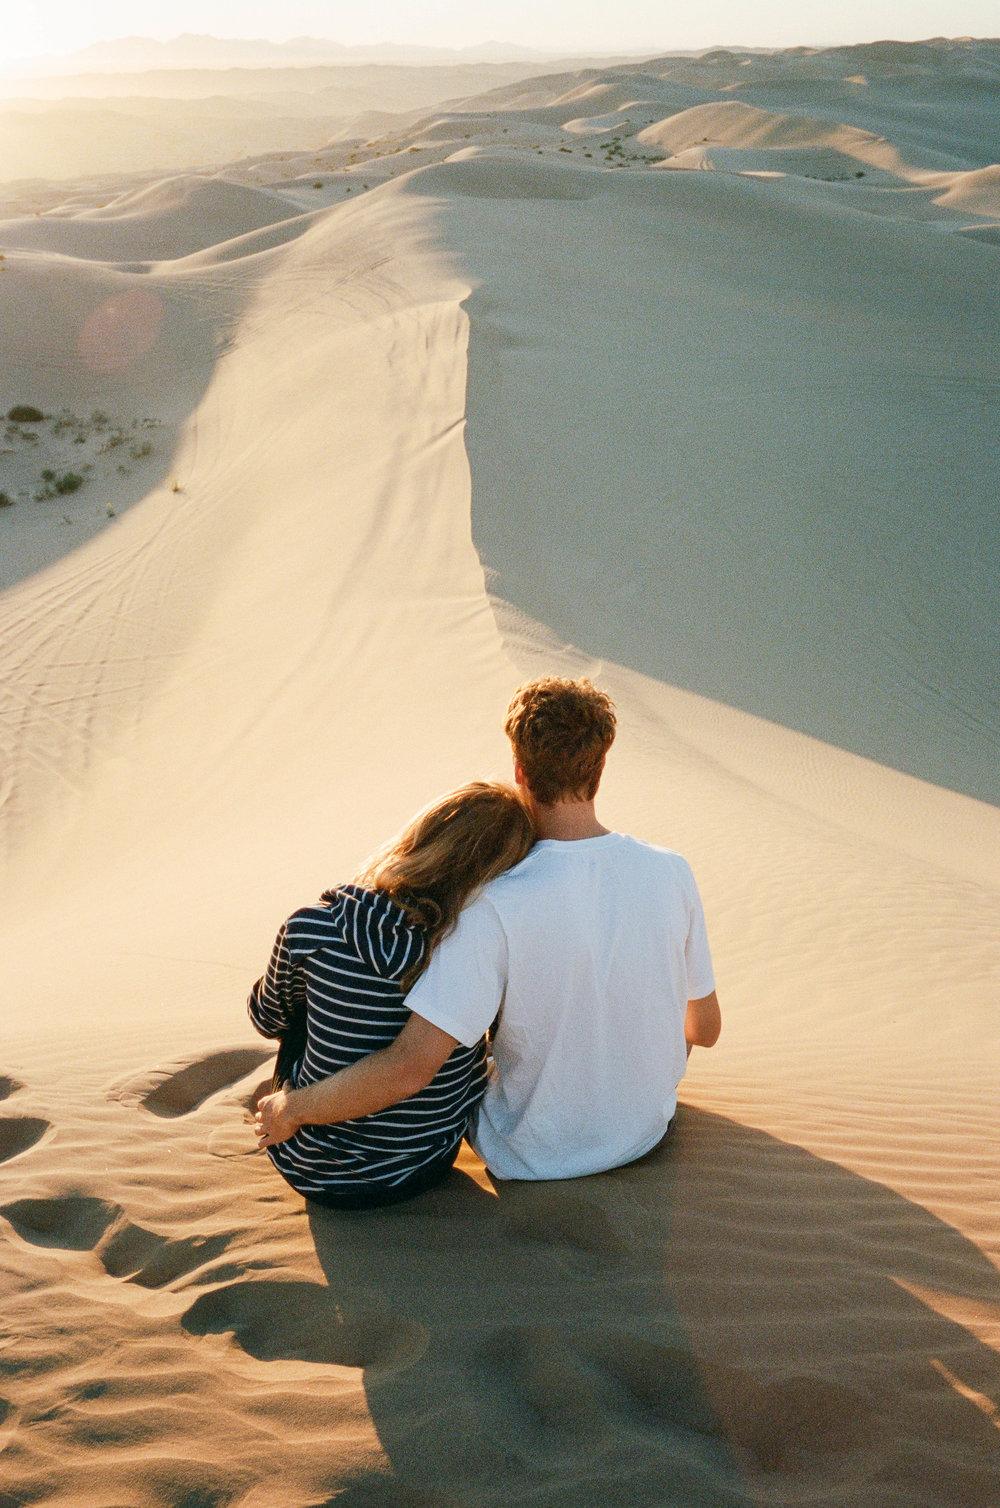 Sand Dunes_#9872-14.jpg